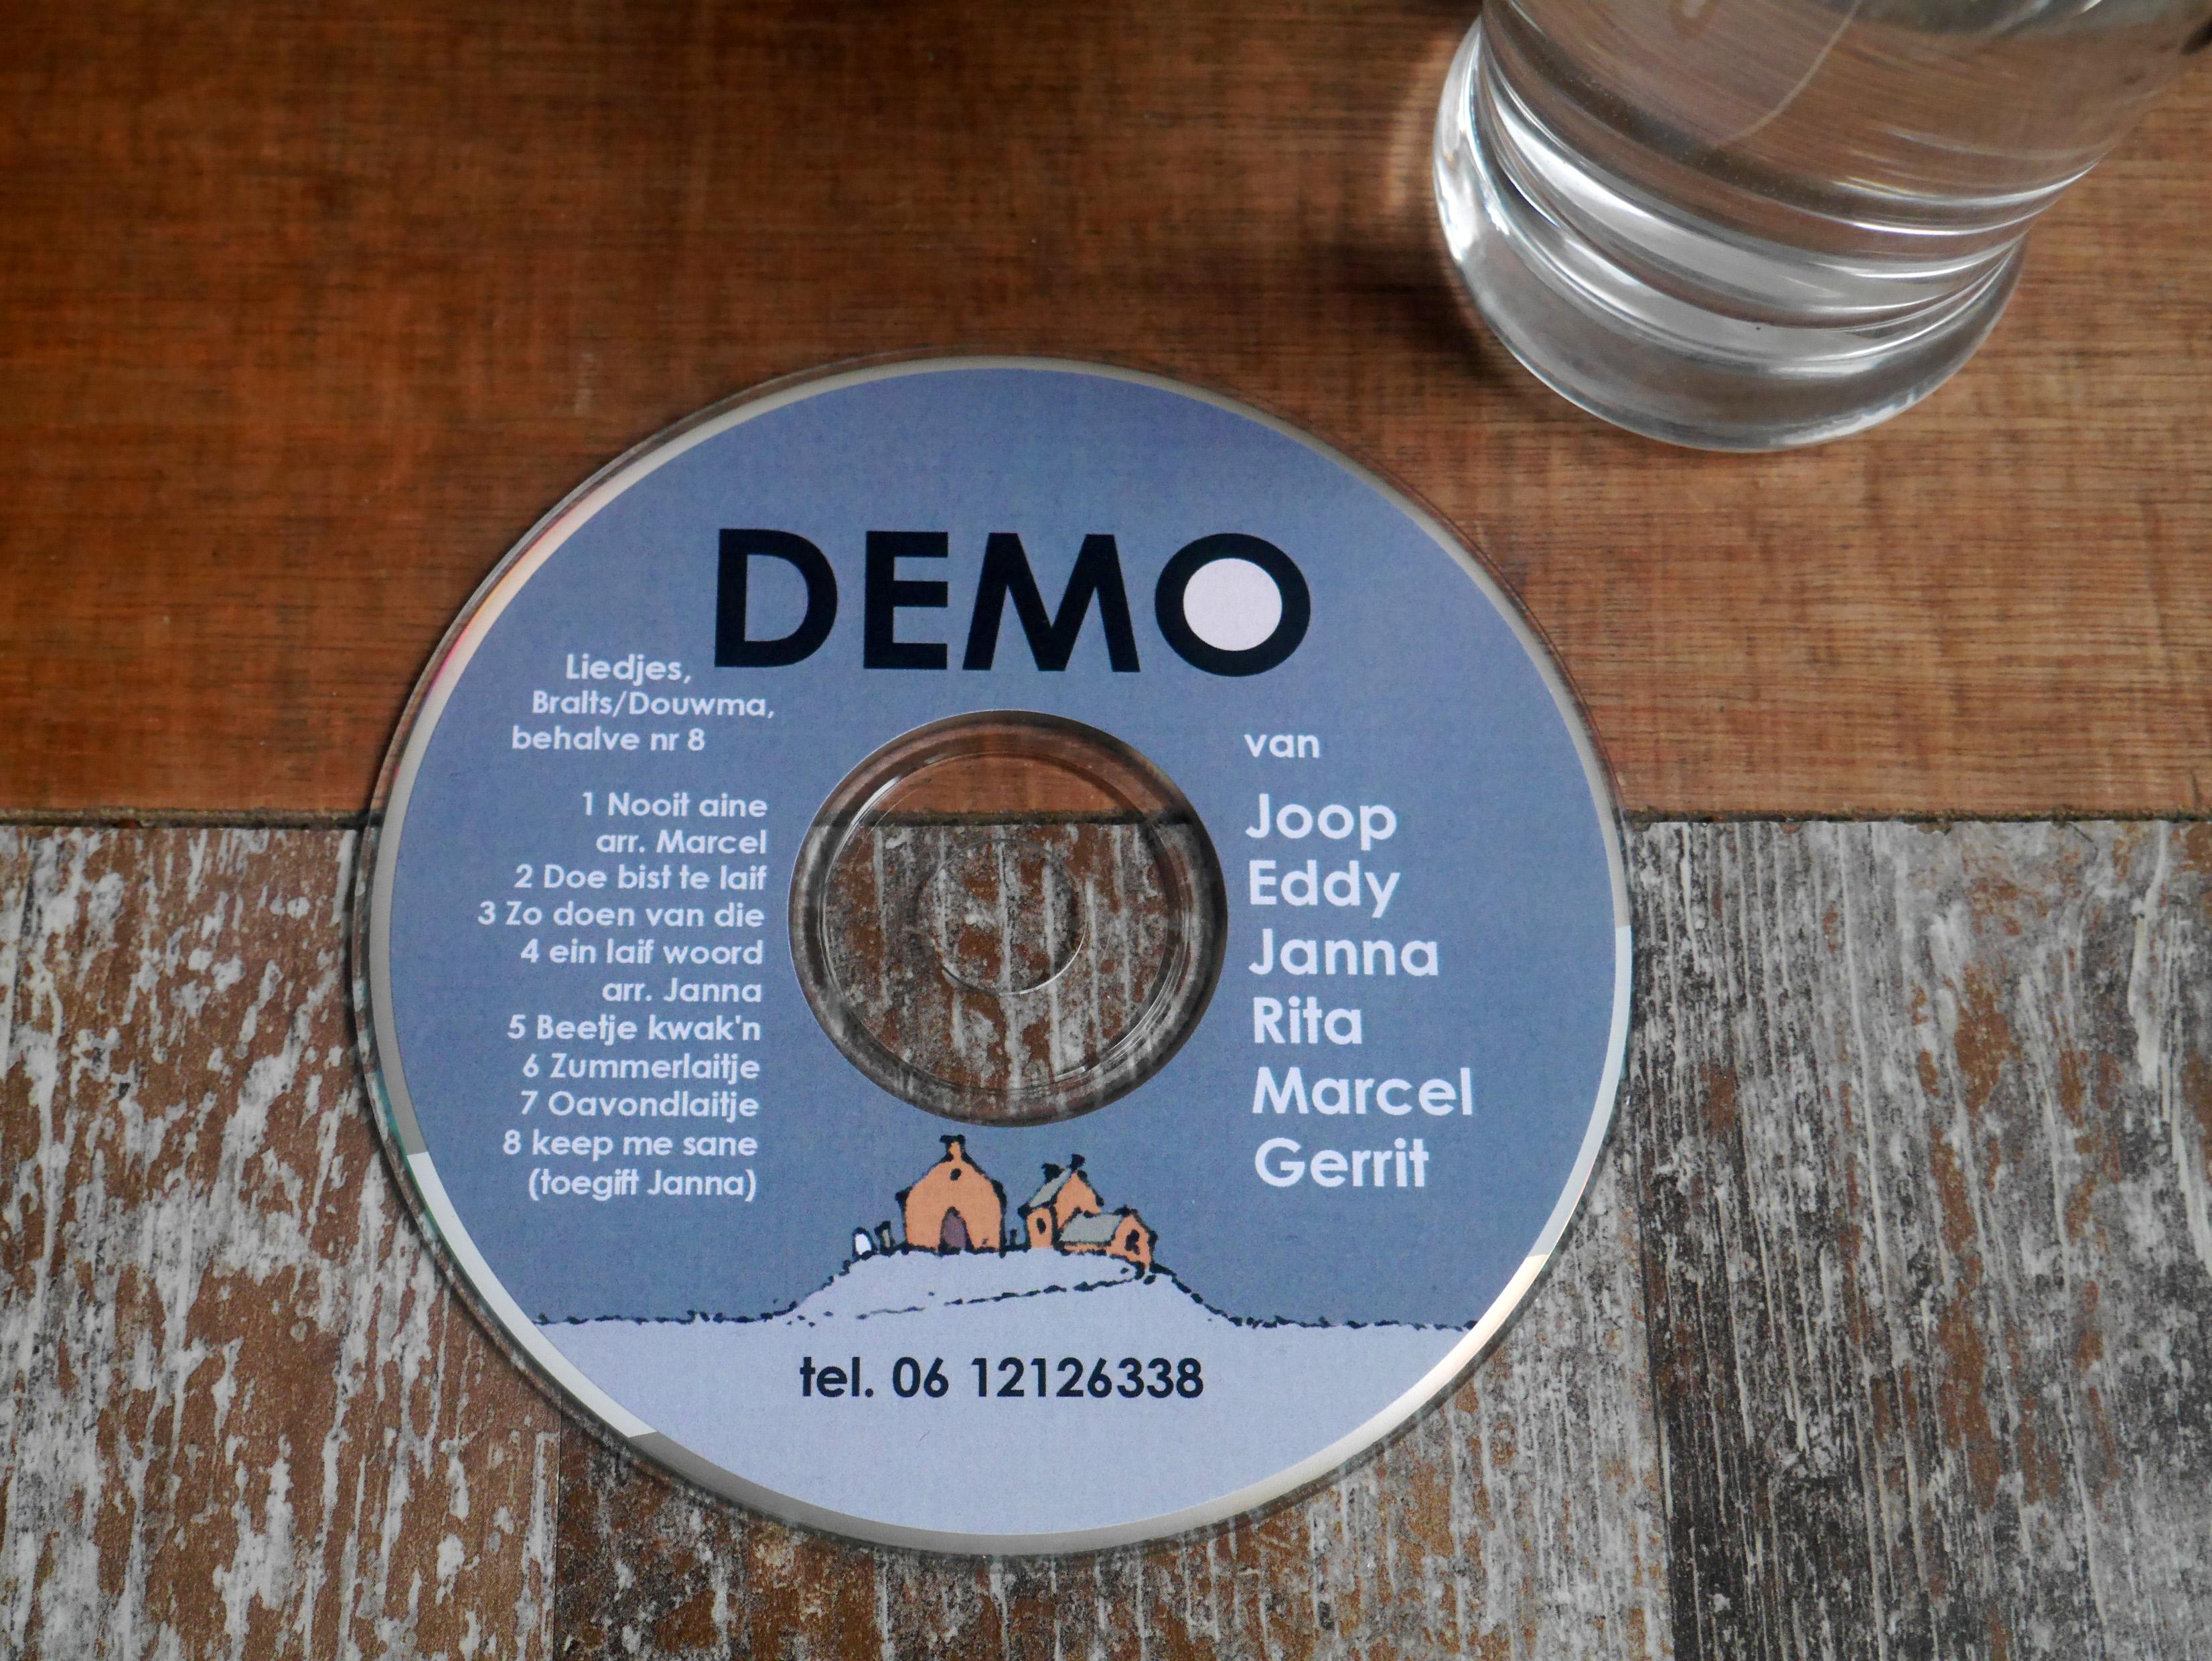 demo joop